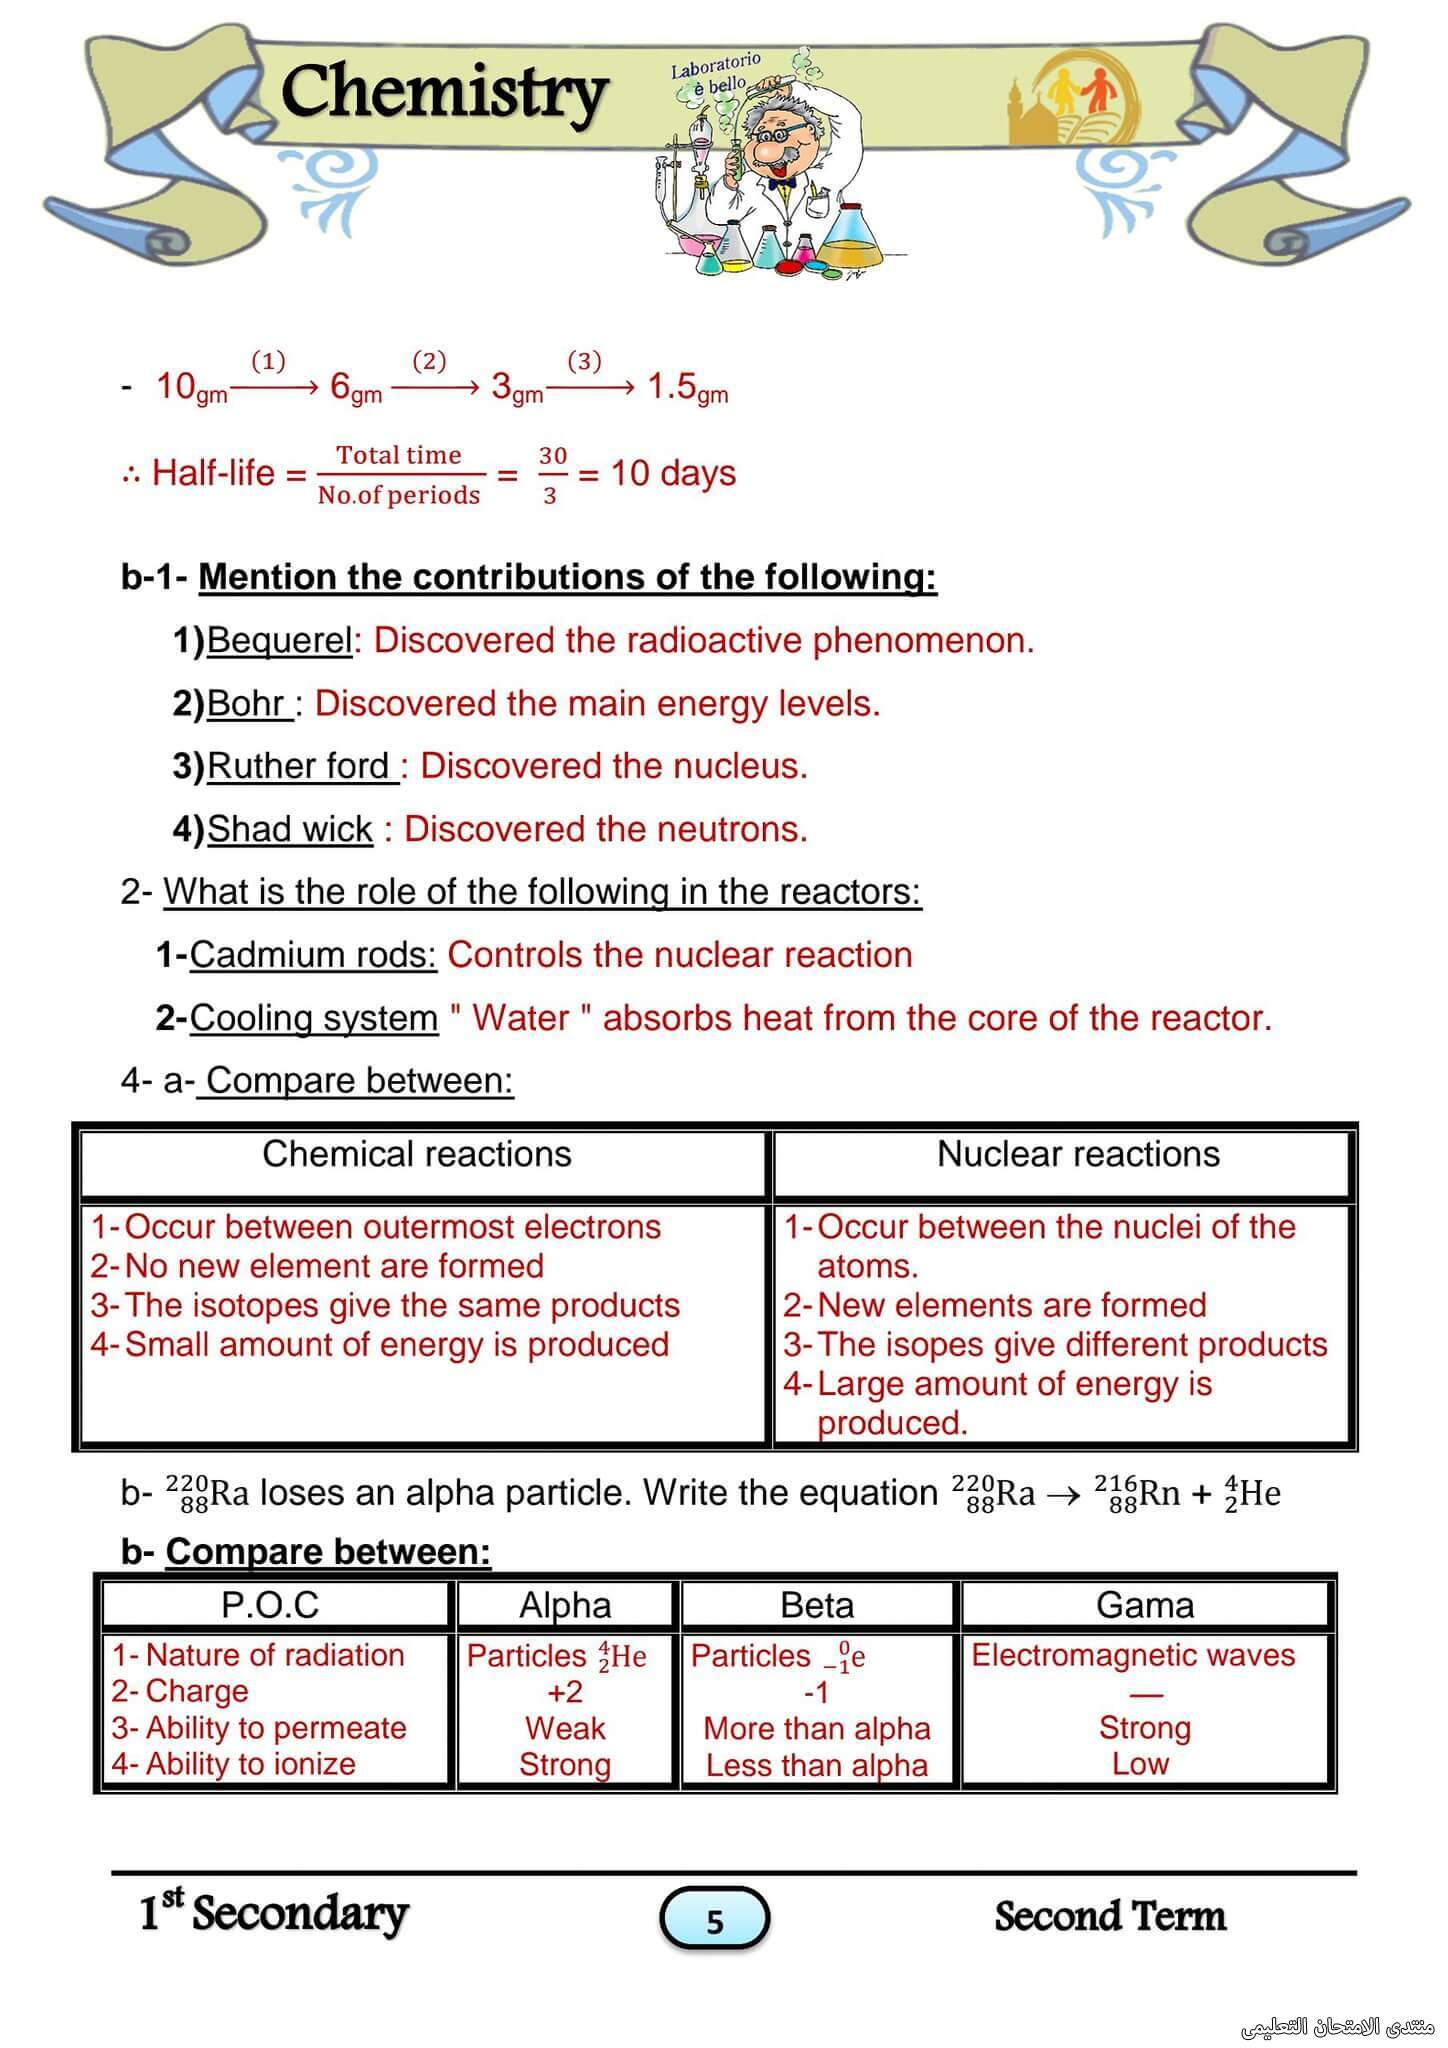 exam-eg.com_161832665491865.jpg